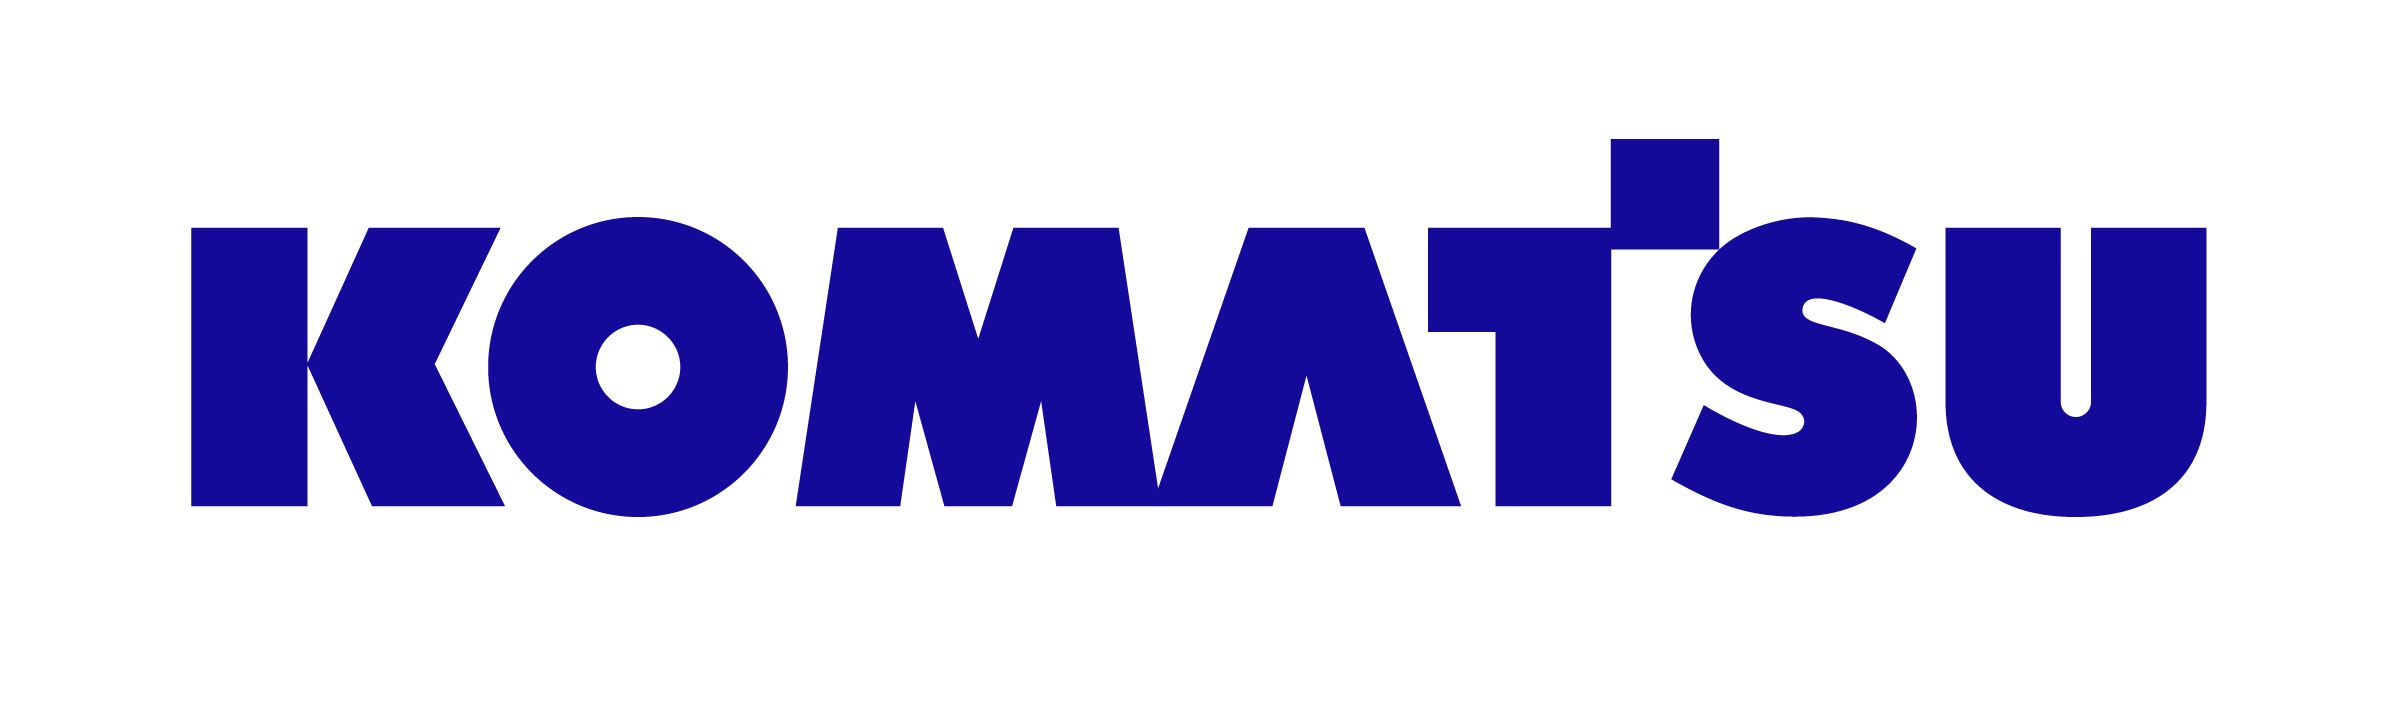 Komatsu Mining Corporation Logo